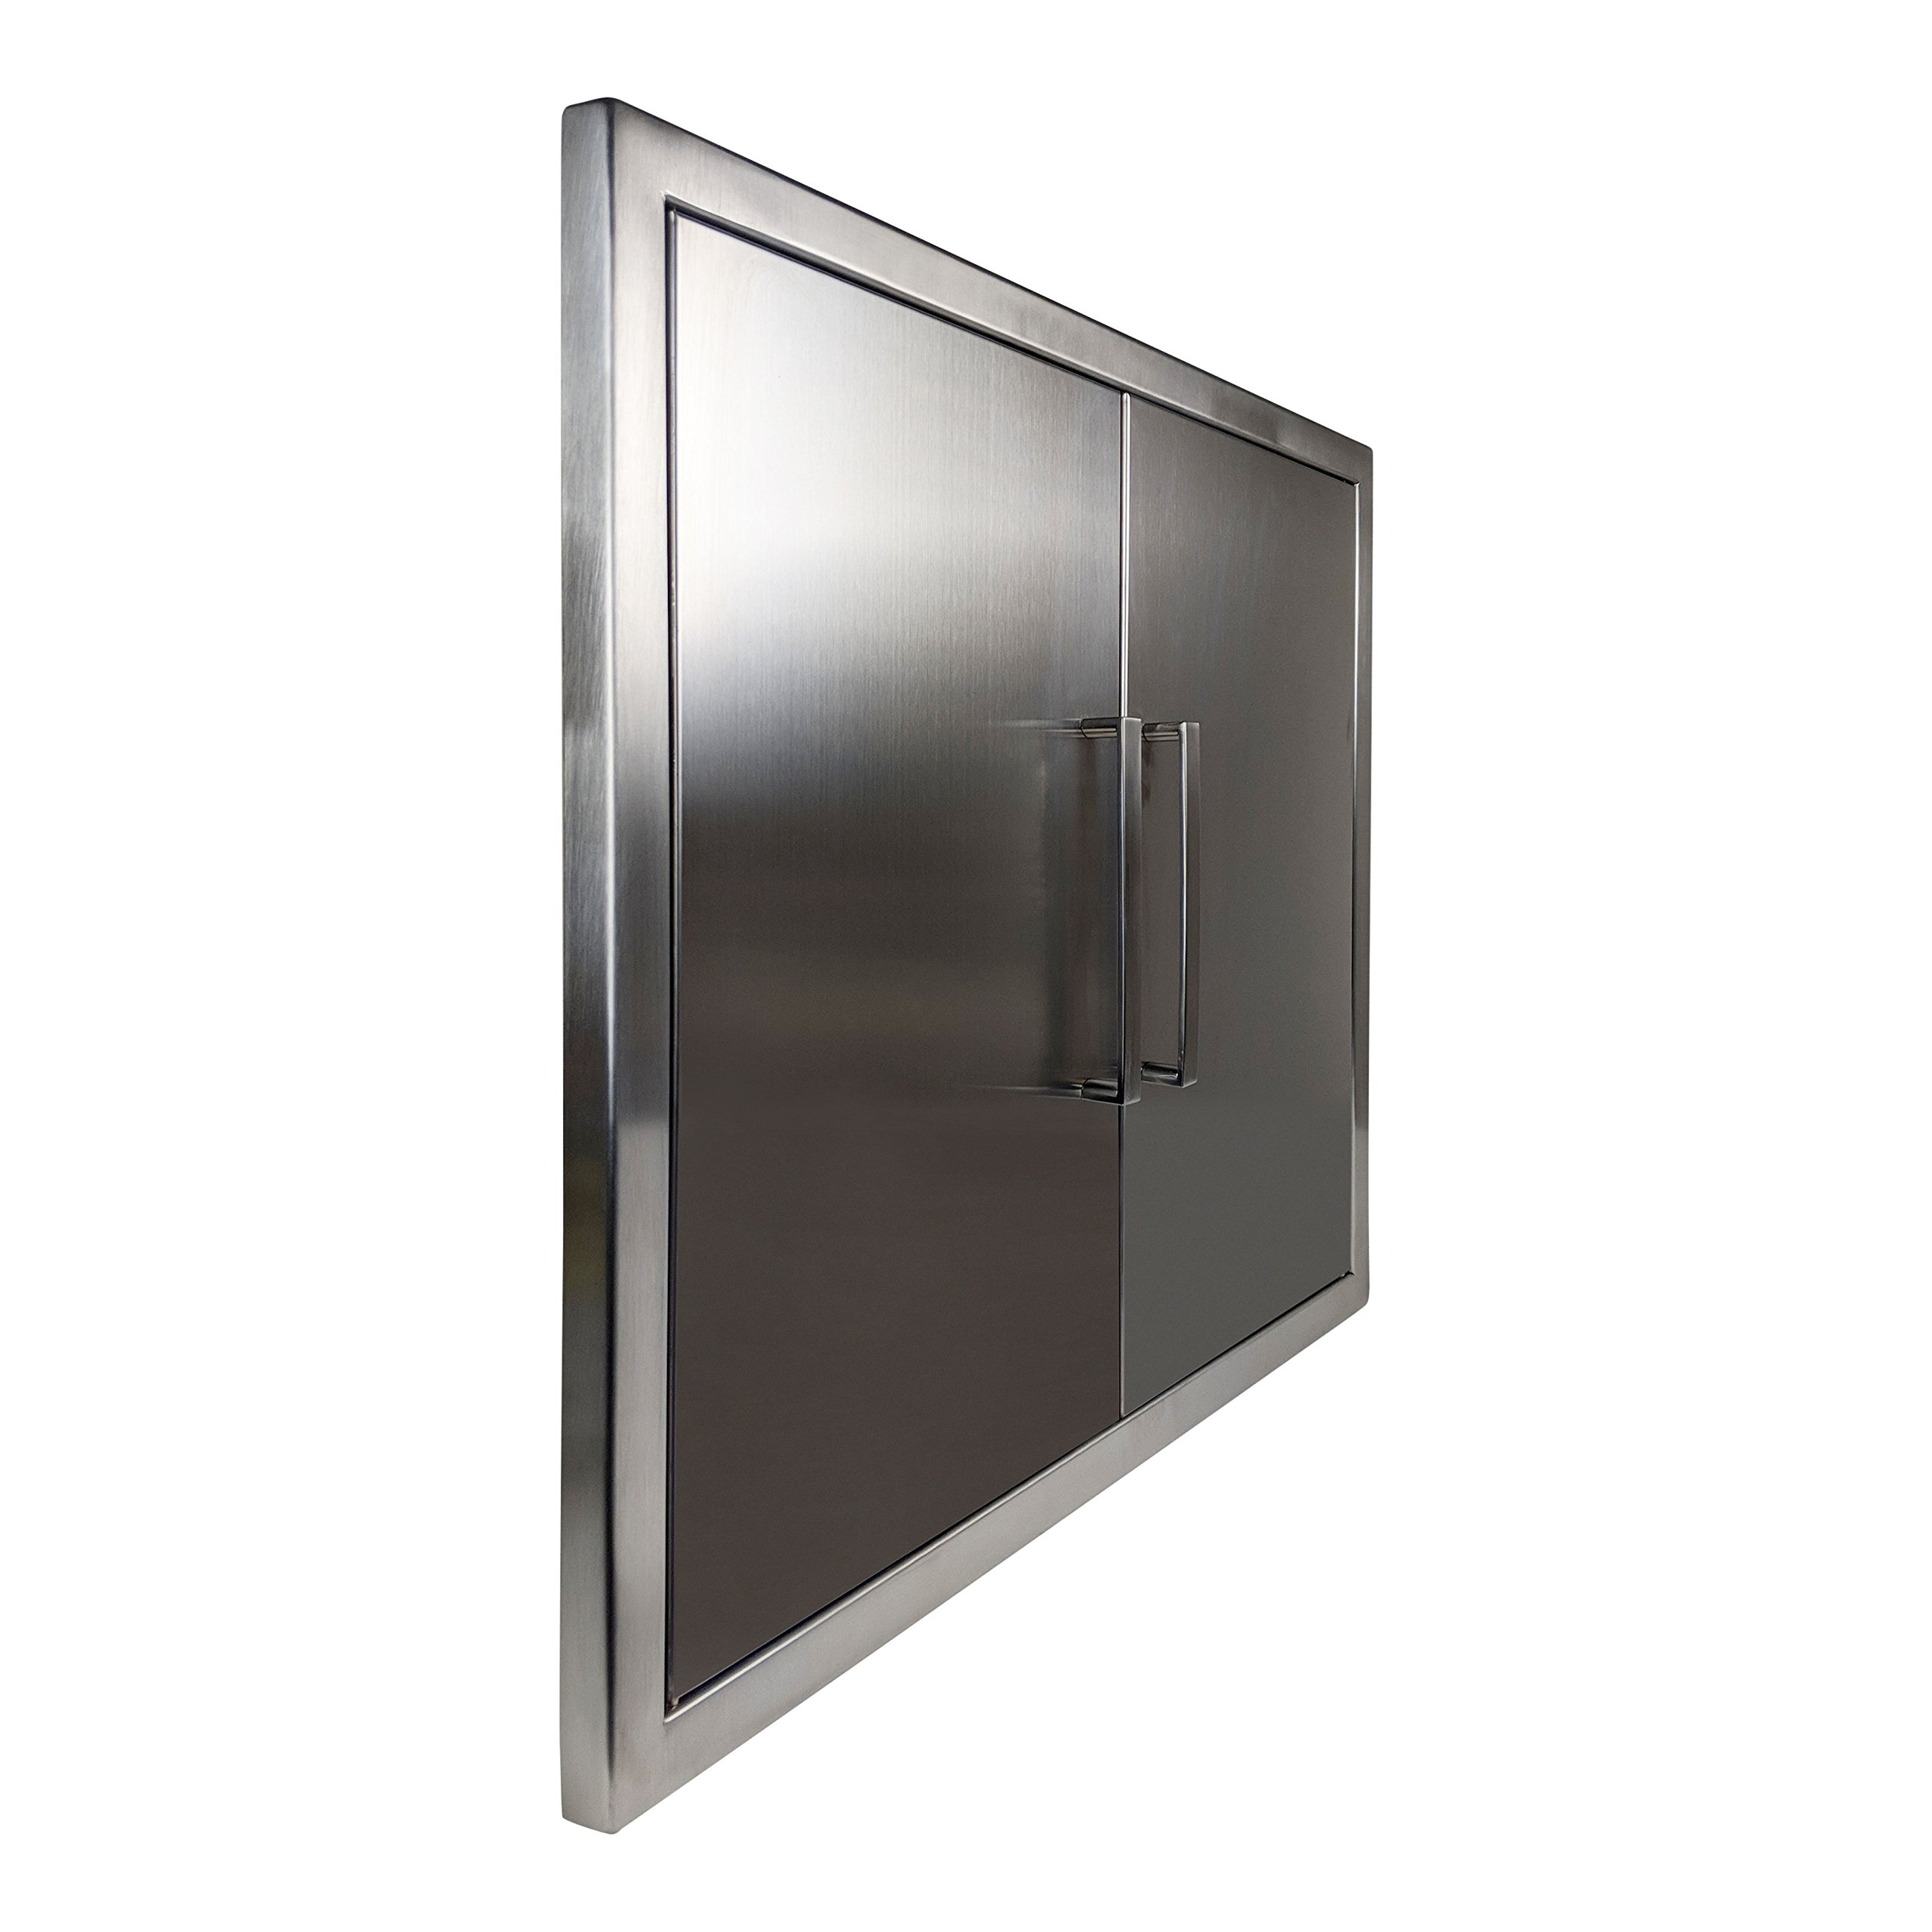 Katzington BBQ ACCESS DOORS - Modern Style - 31'' Double Doors - 304 Grade Stainless Steel - Double Walled Construction - Barbecue Island/Outdoor Kitchen Access Door - Built-in Paper Towel Holder